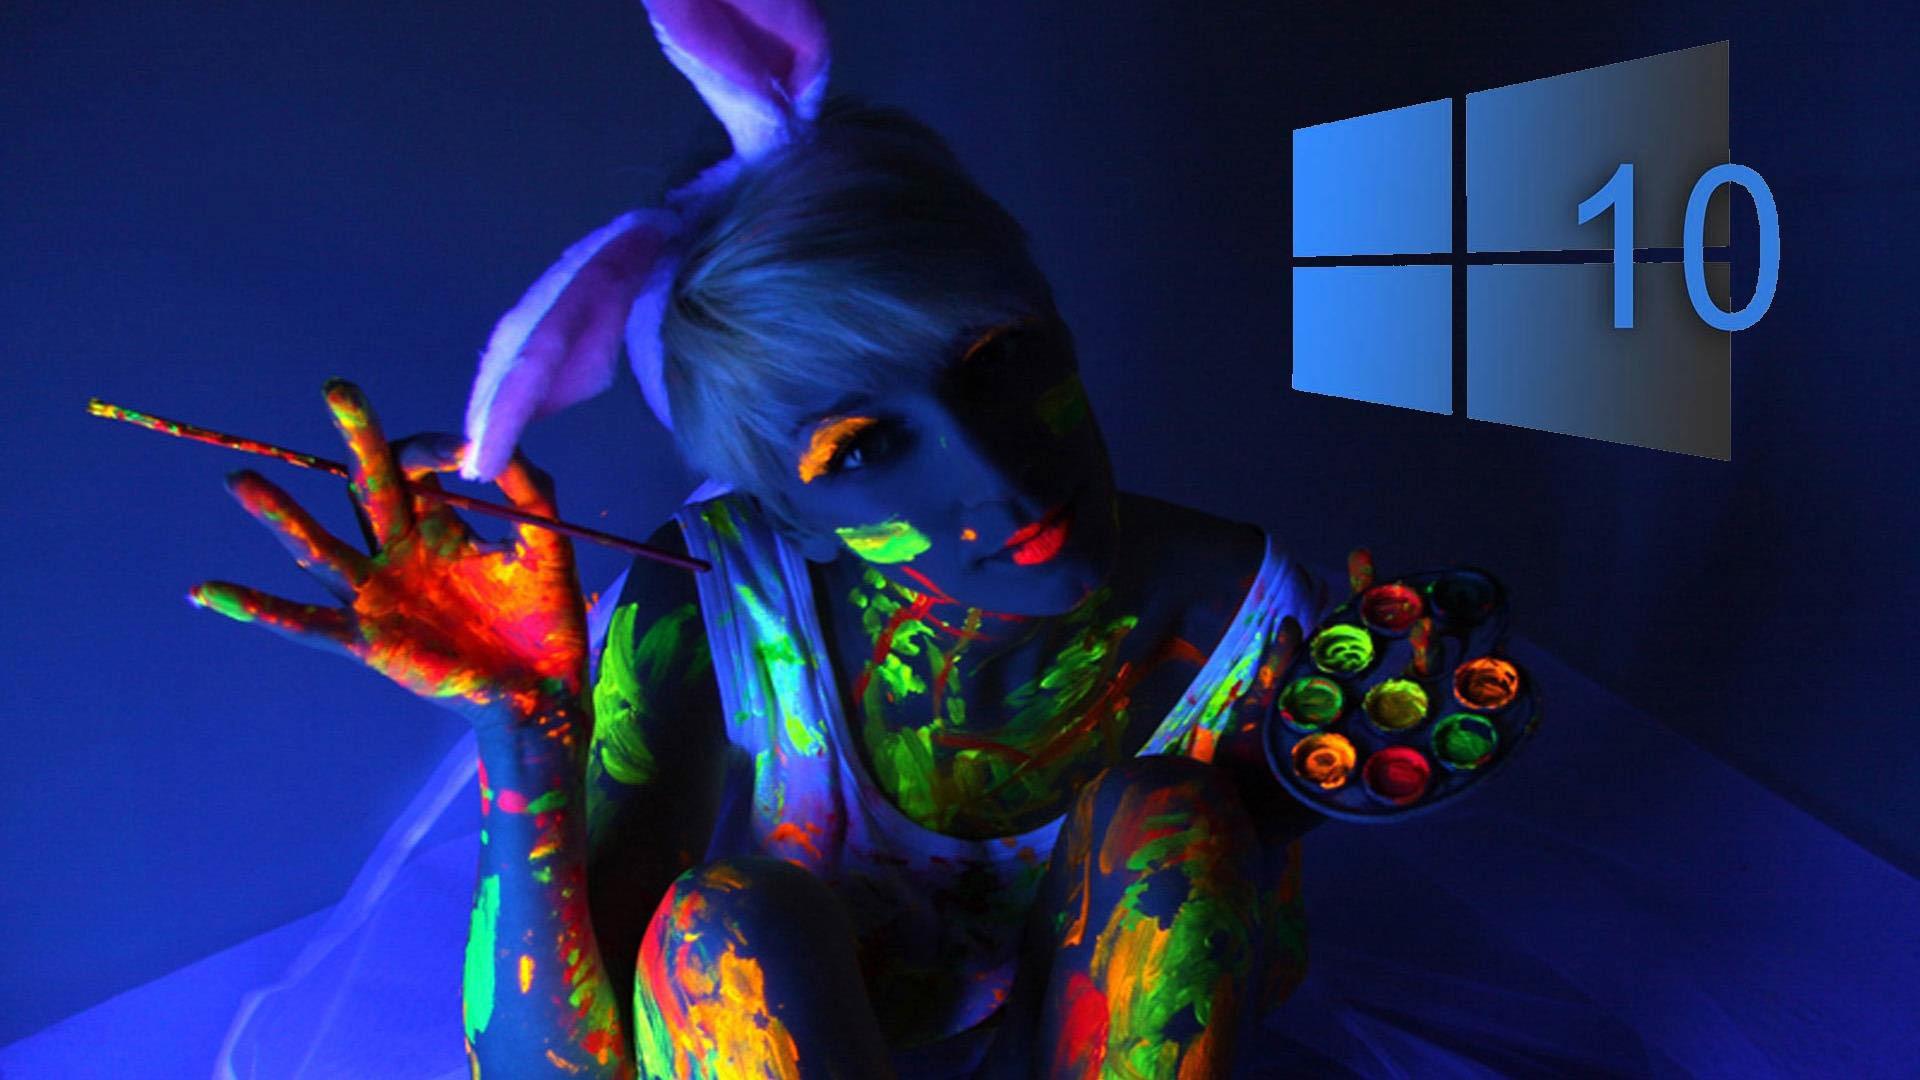 Wallpaper Windows 10 87 Images